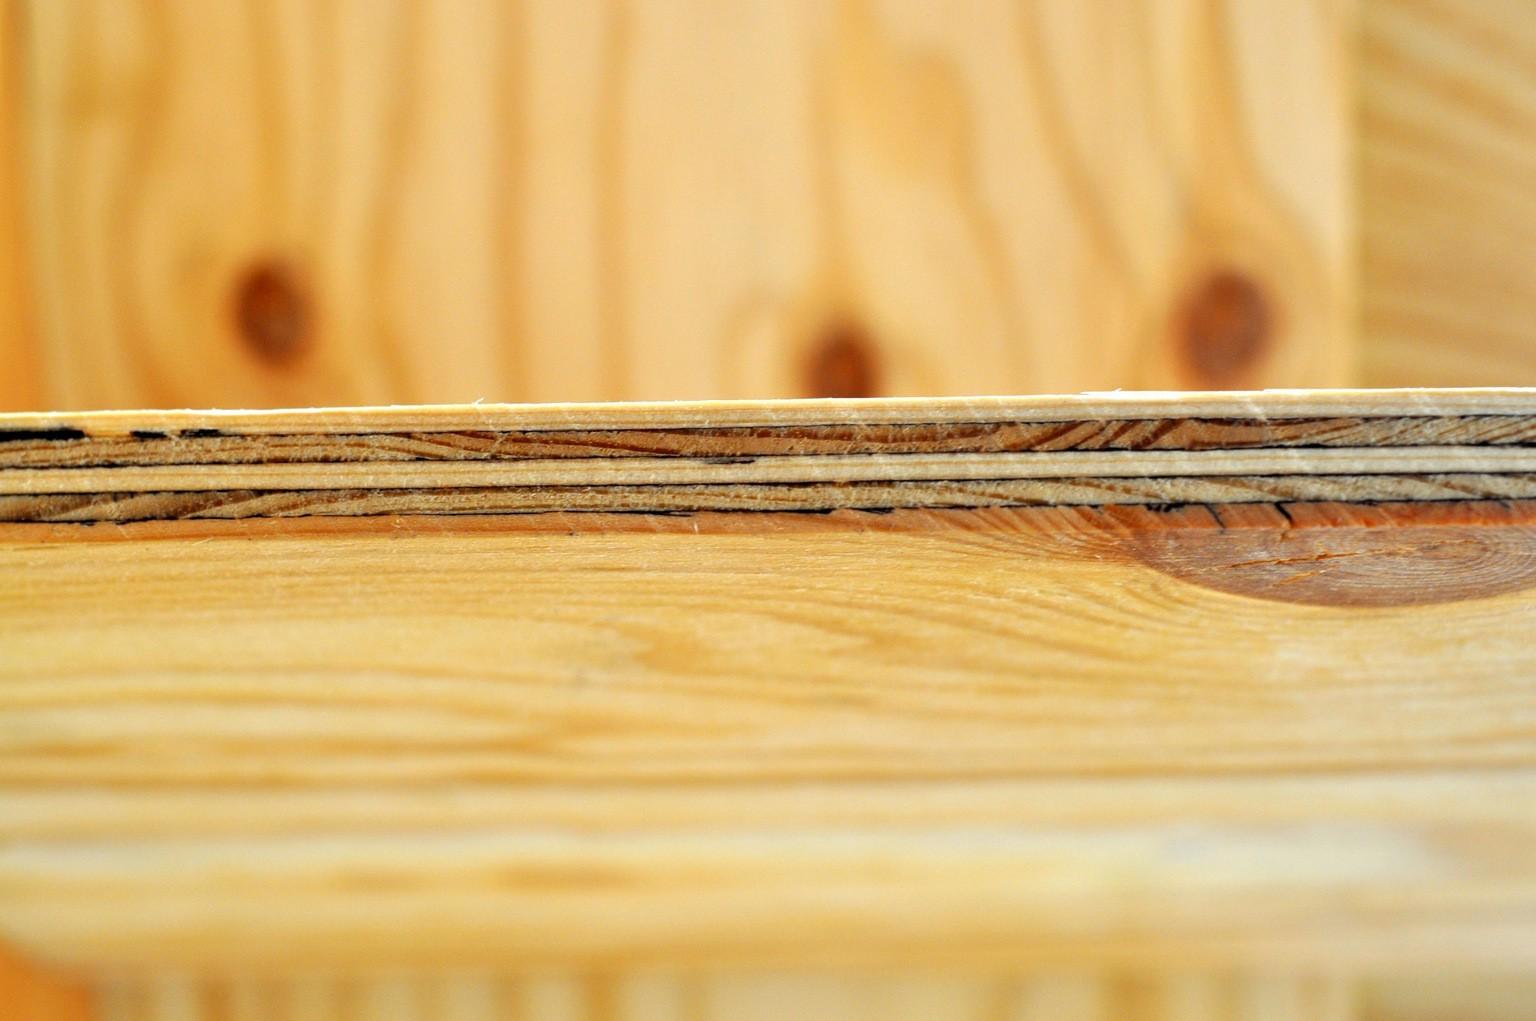 meyer timber ltd | linkedin